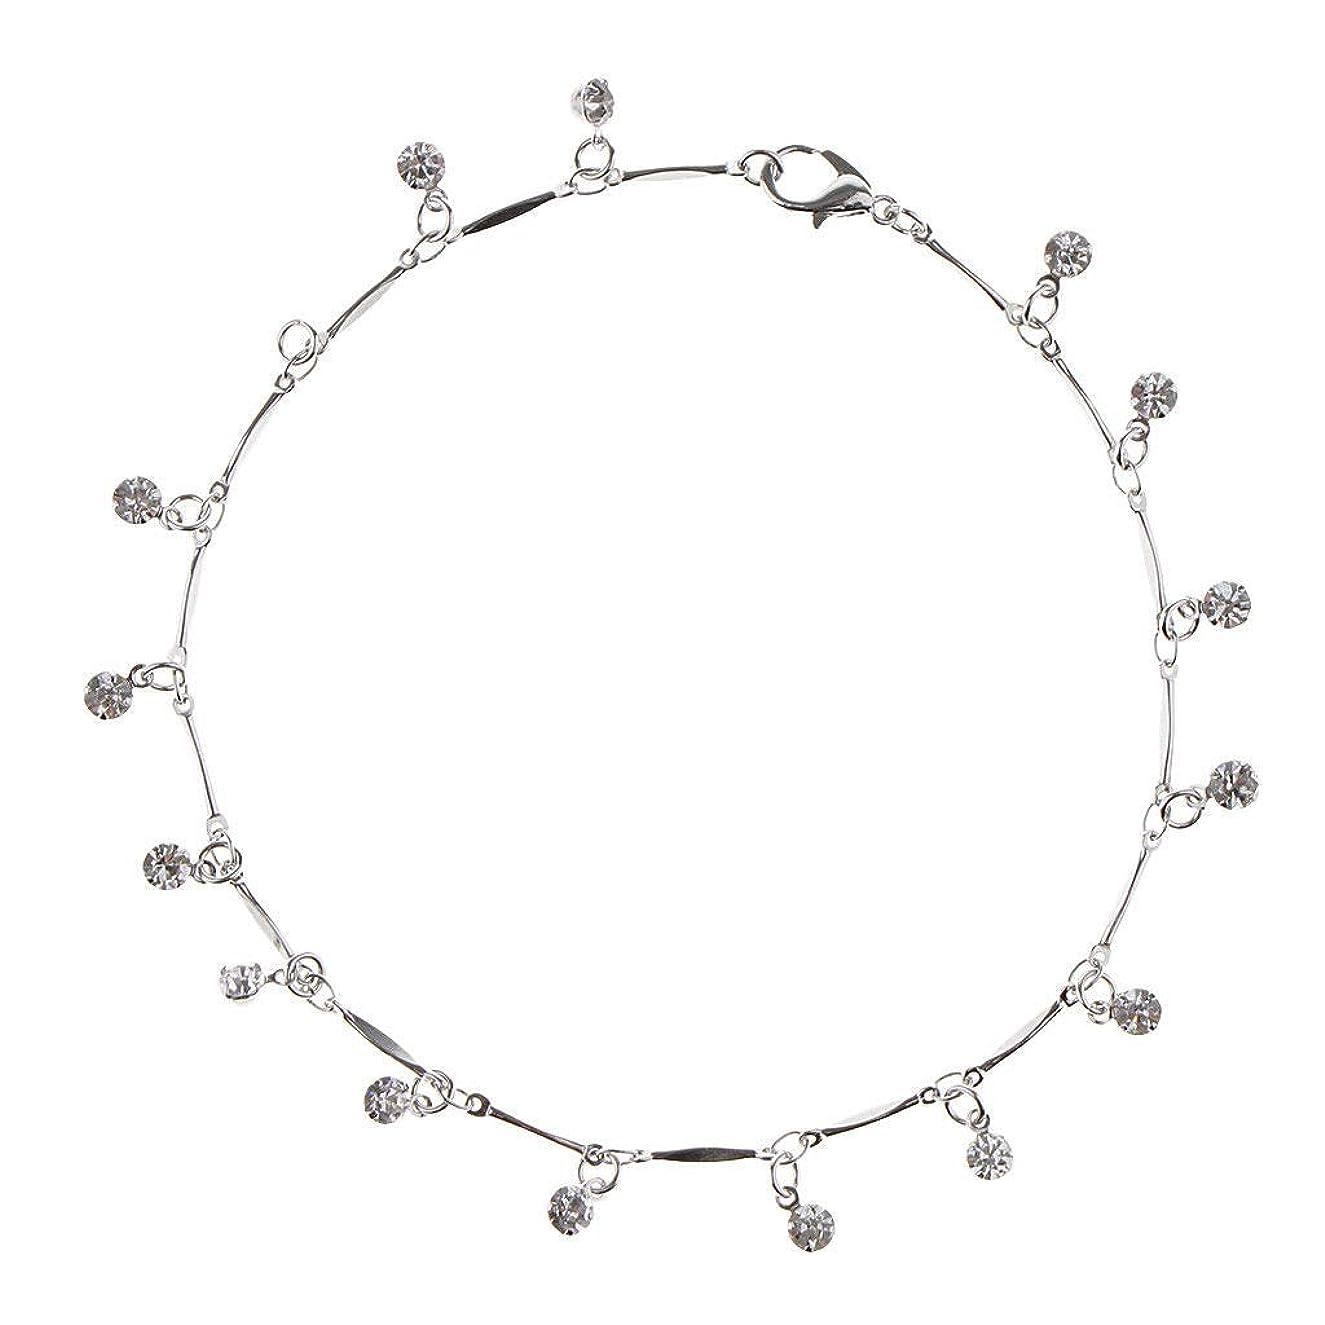 25.5cm Womens Silver Rhinestone Crystal Anklet Bracelet Jewelry Accessory